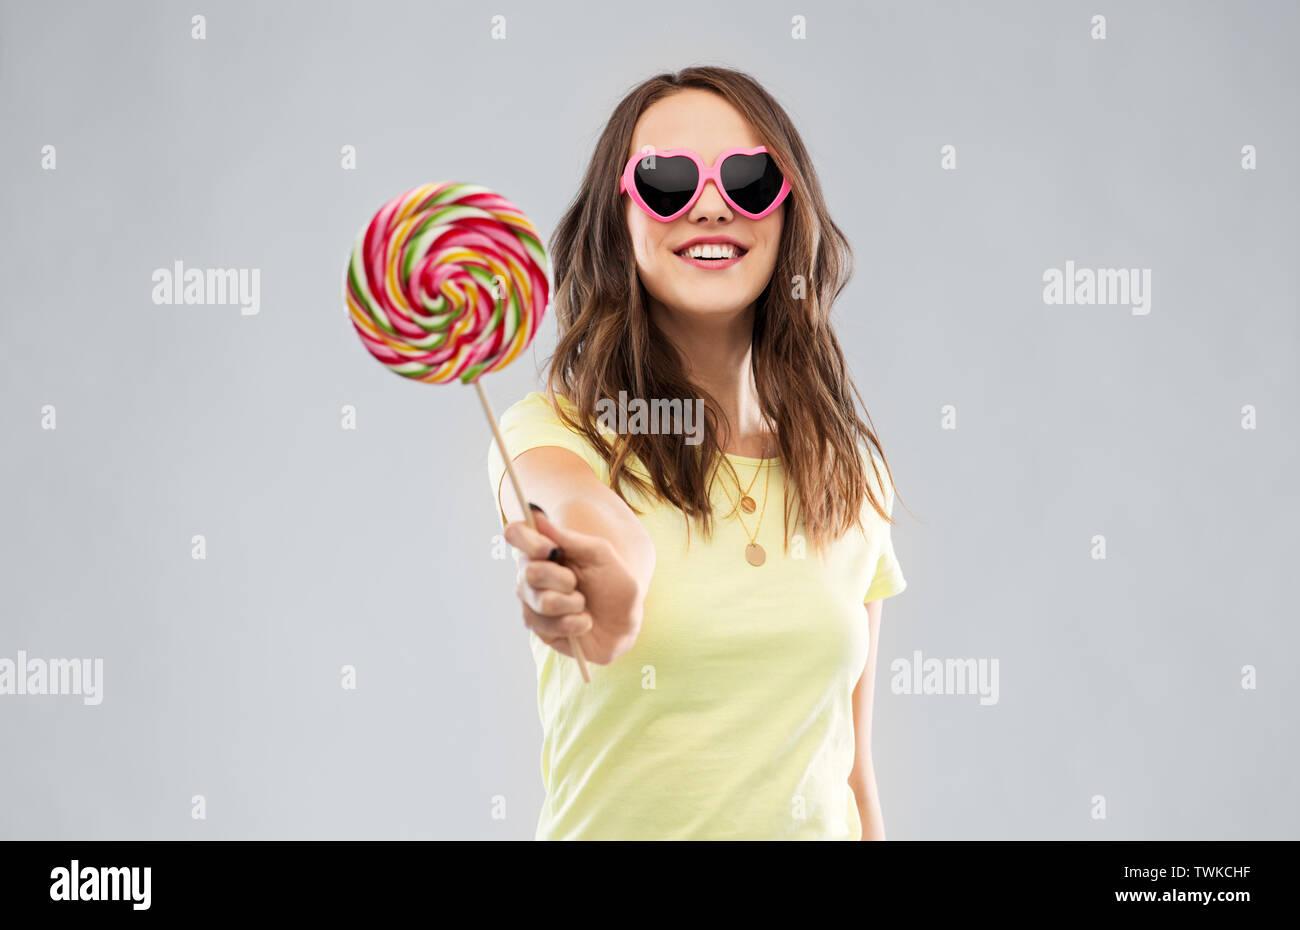 teenage girl in sunglasses with lollipop - Stock Image